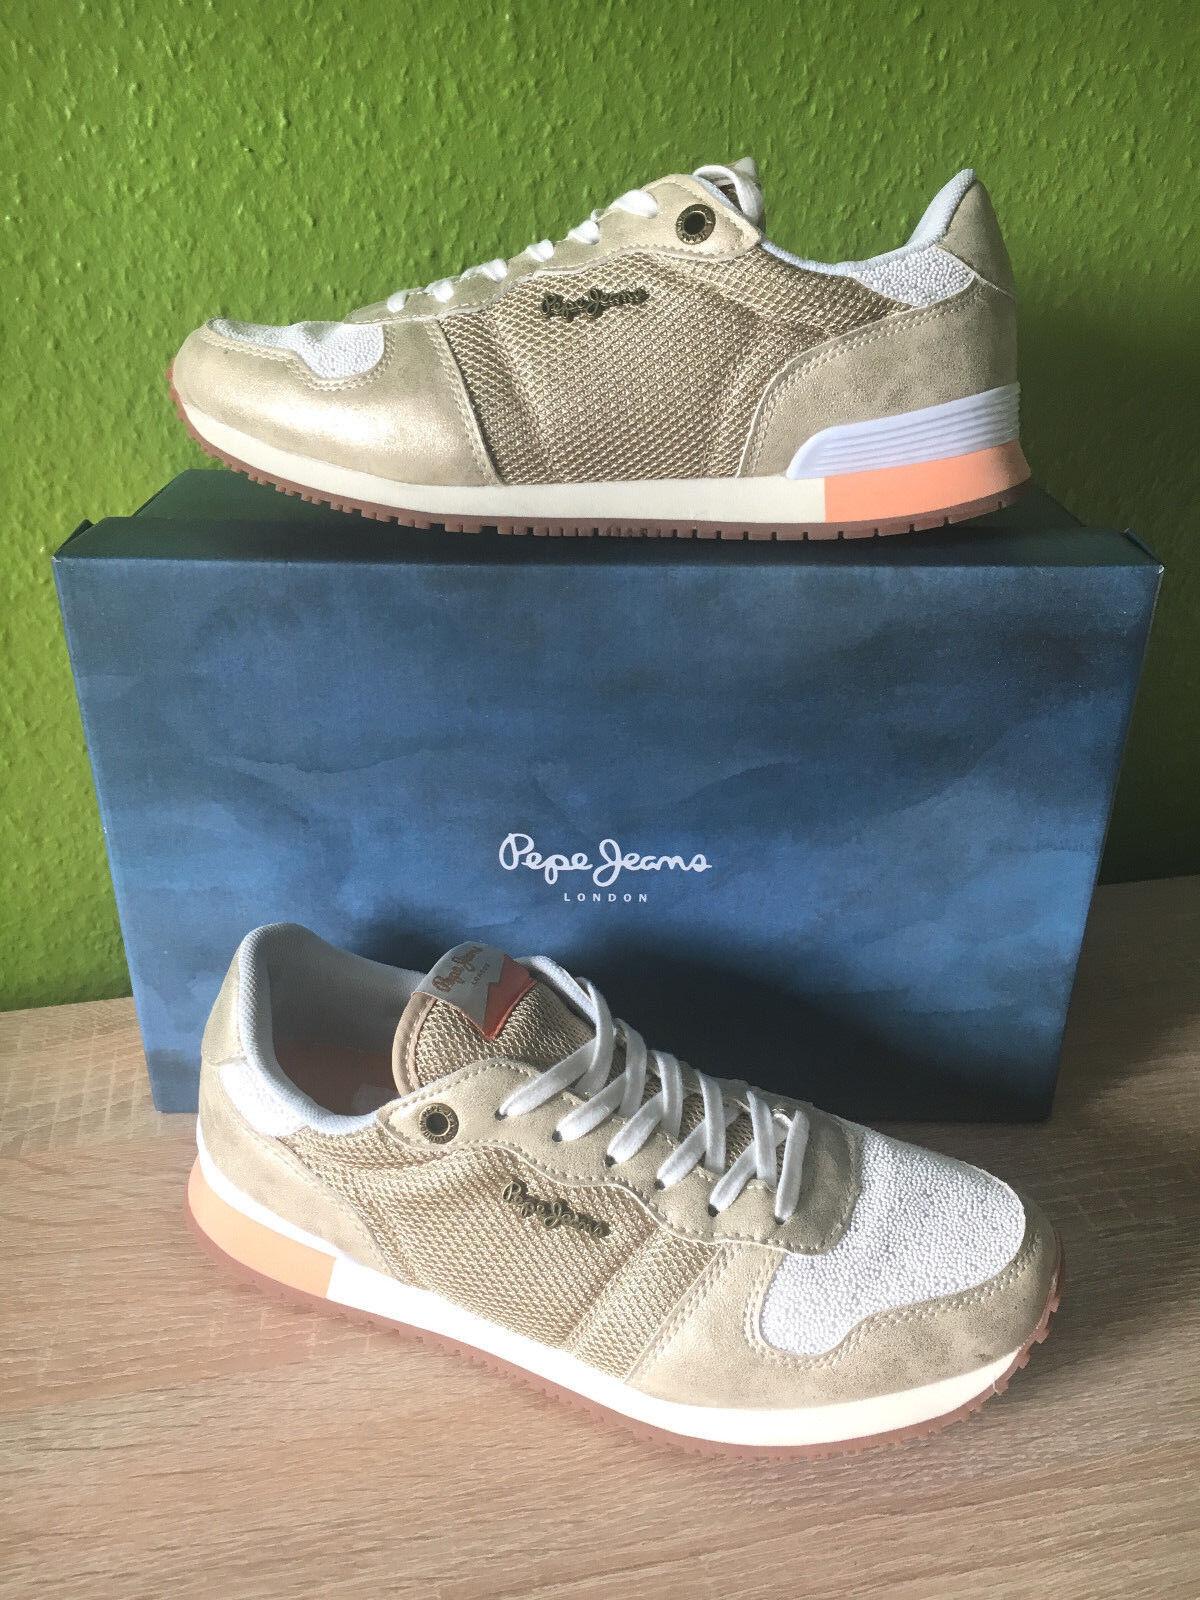 Pepe Jeans London GABLE GOLD - - Damen Schuhe Sneaker - GOLD PLS30327 apart - sportlich 05569c